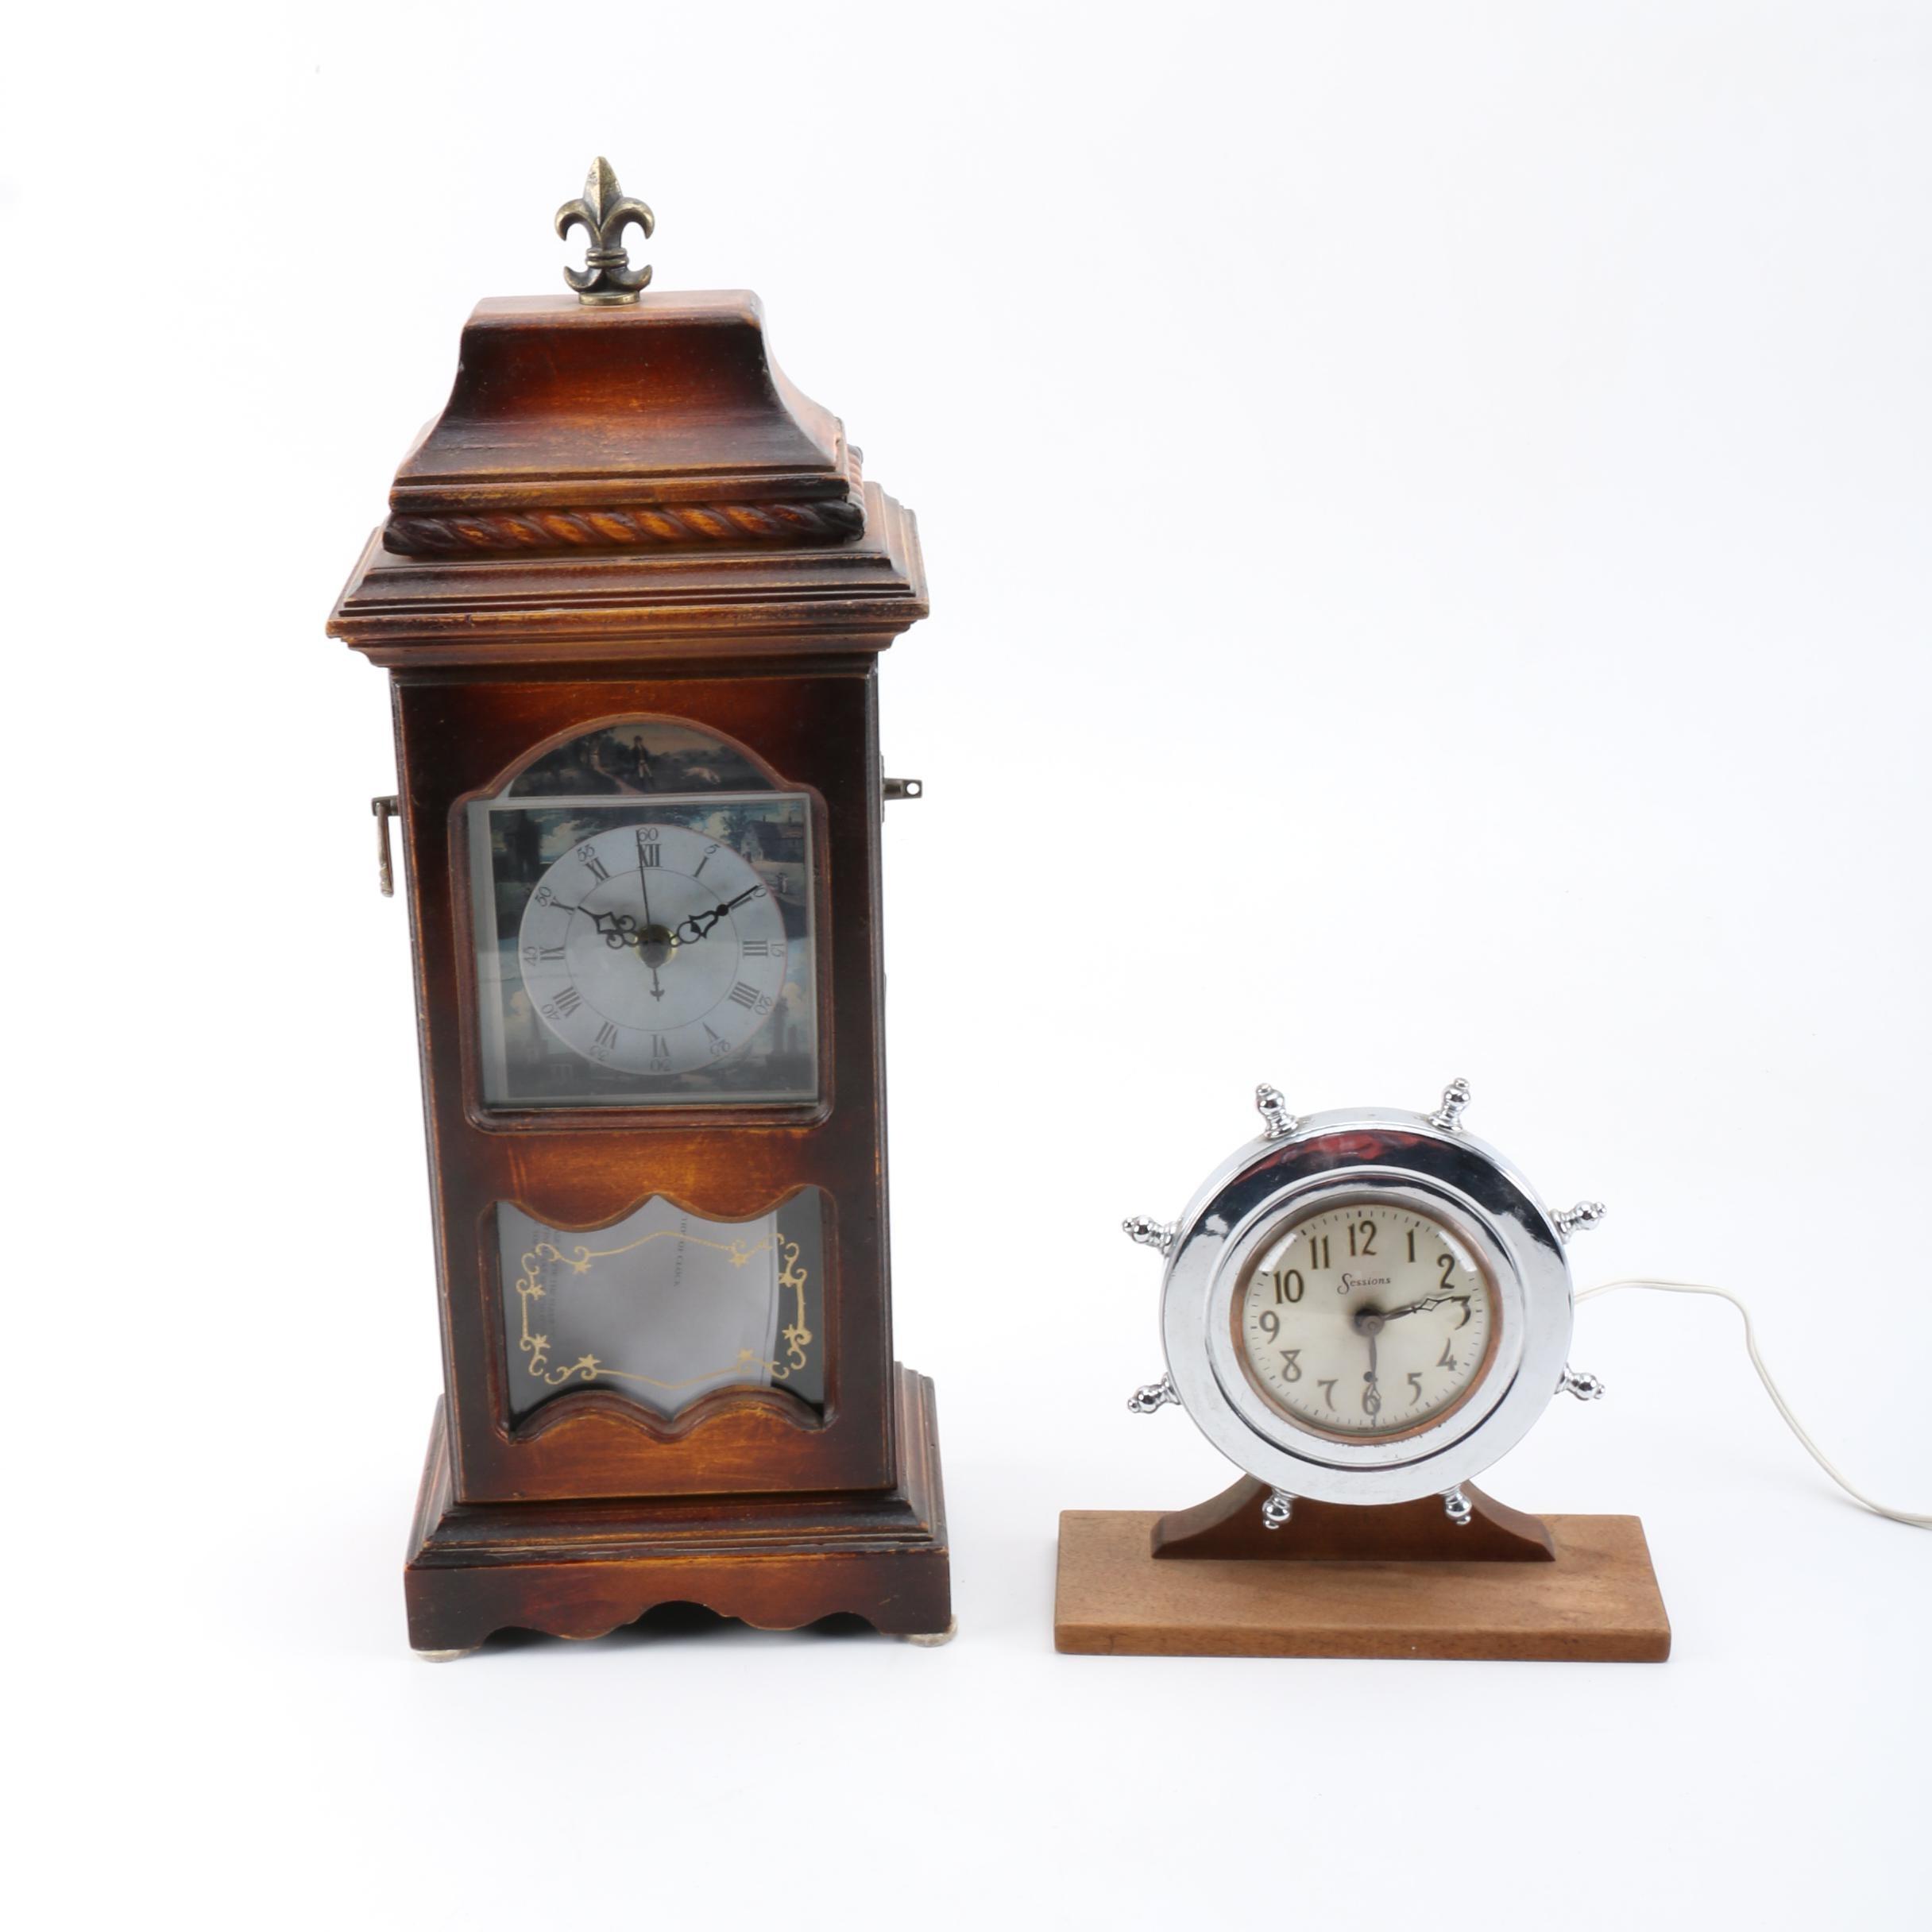 Gothic and Nautical Style Mantel Clocks